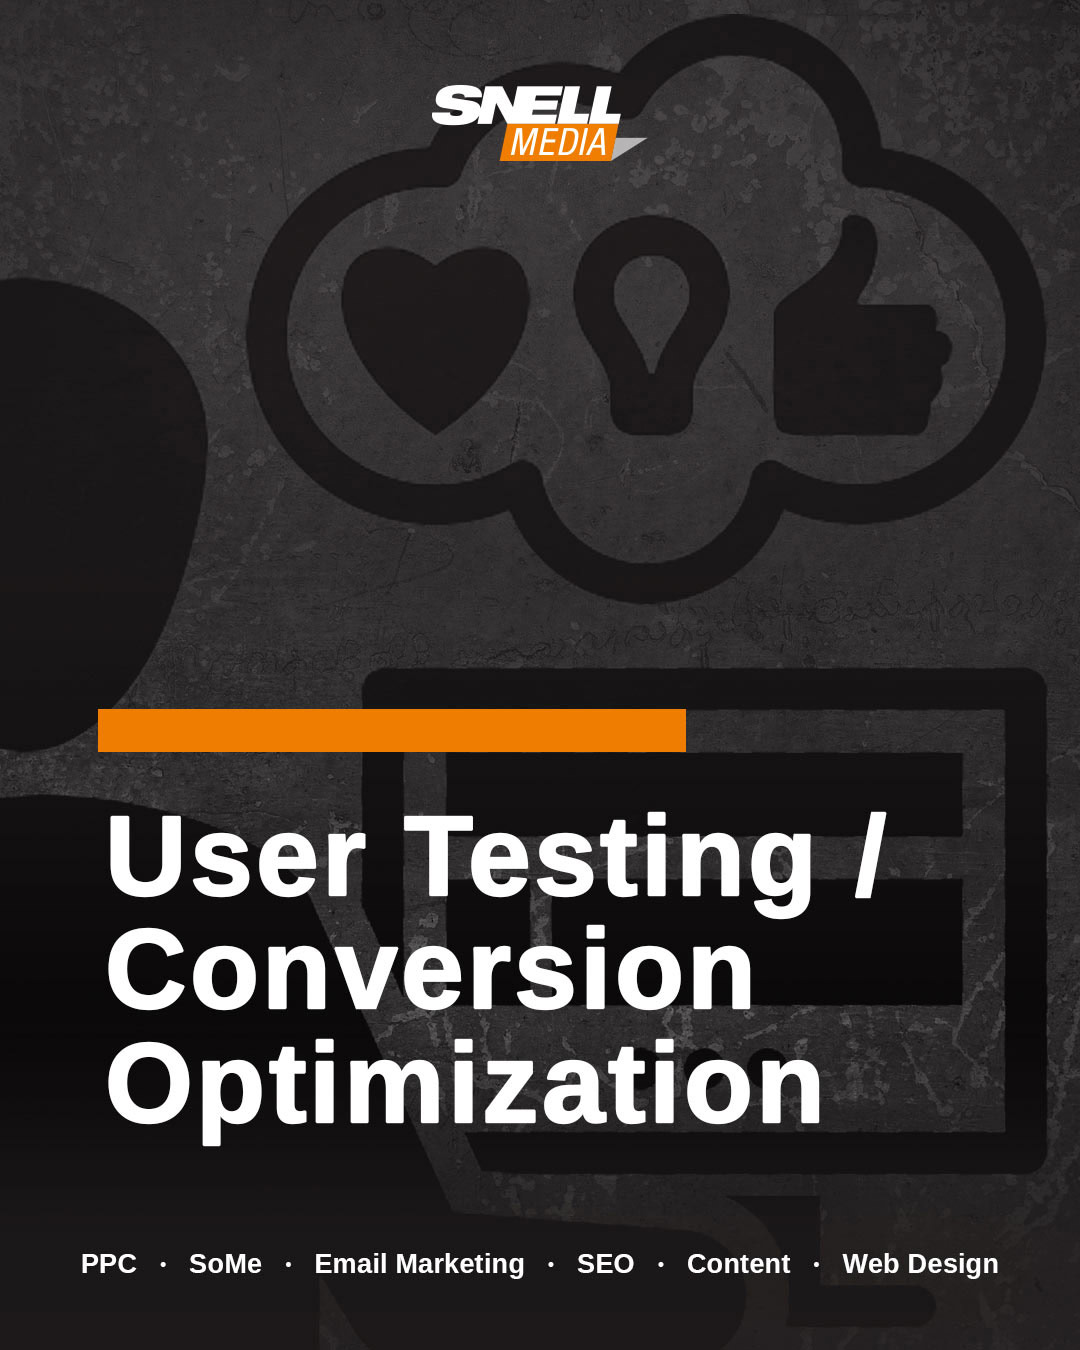 User Testing & Conversion Optimization 7th B2B Digital Marketing Trend